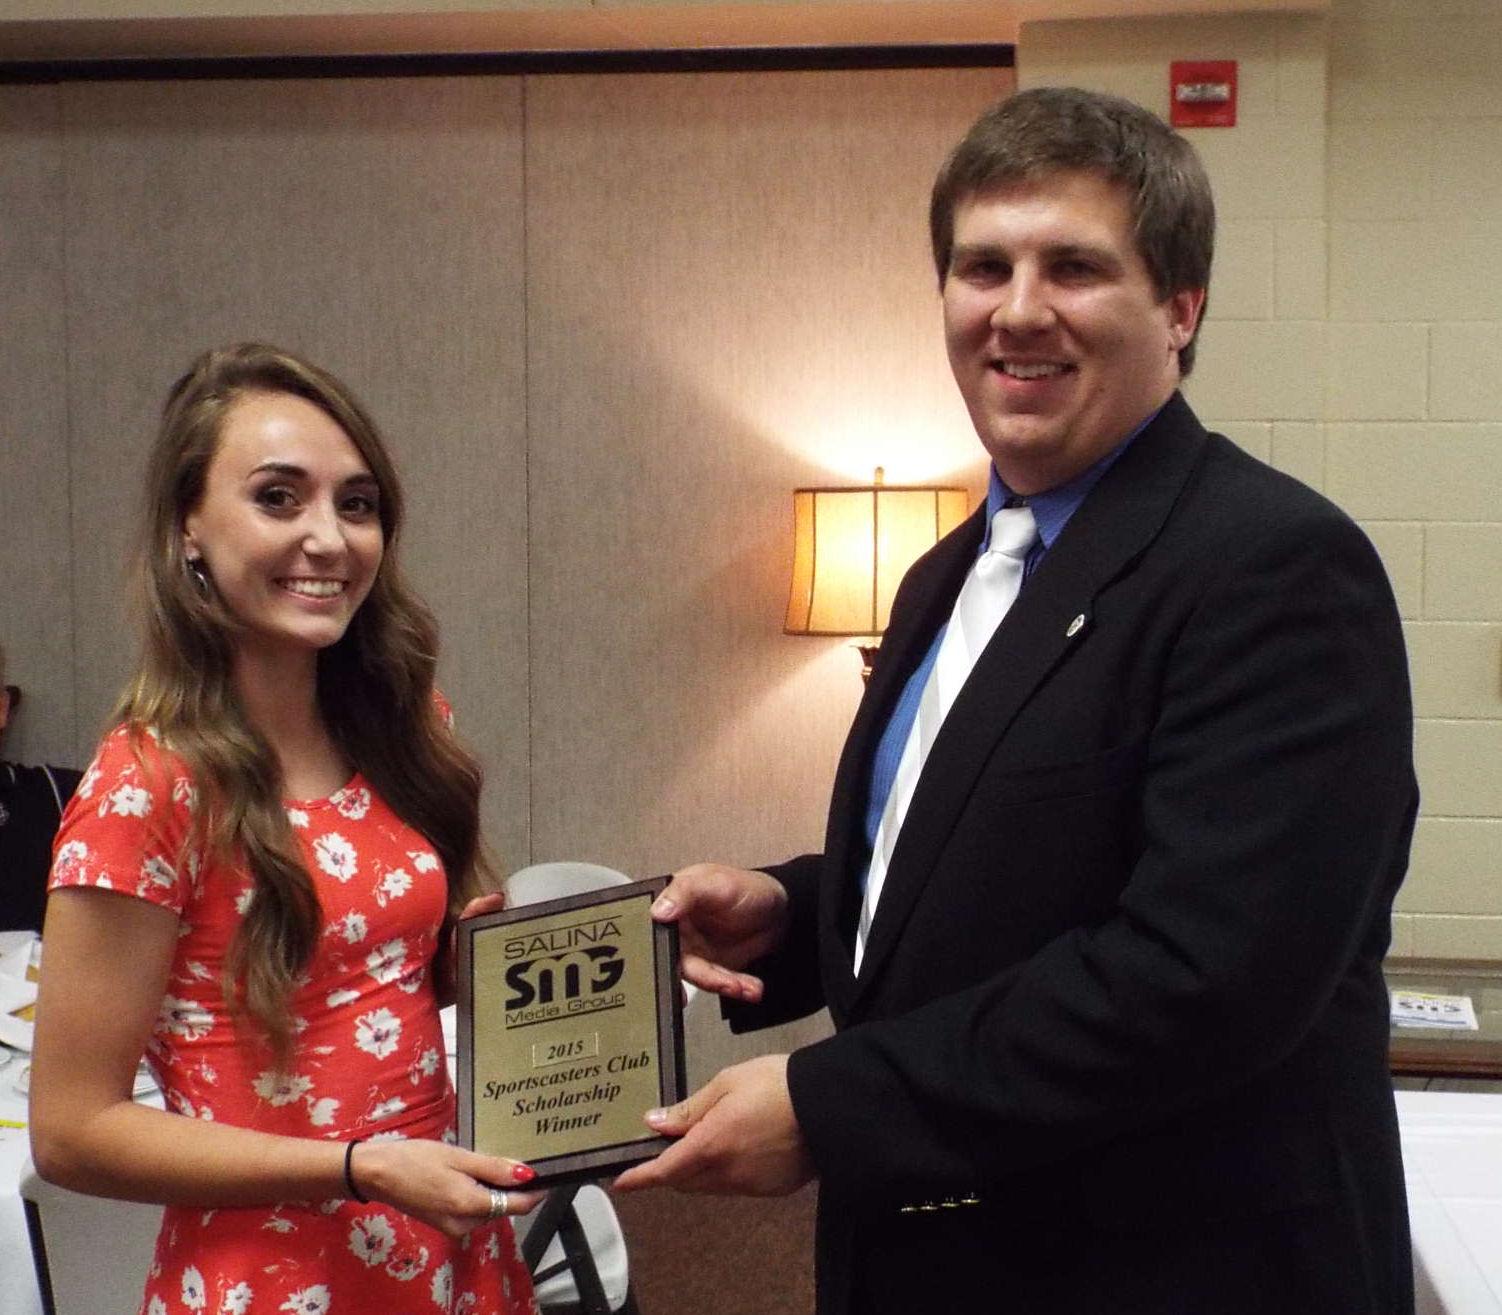 Ell-Saline scholarship winner Emma Drees and KSAL's Mike Hammett.